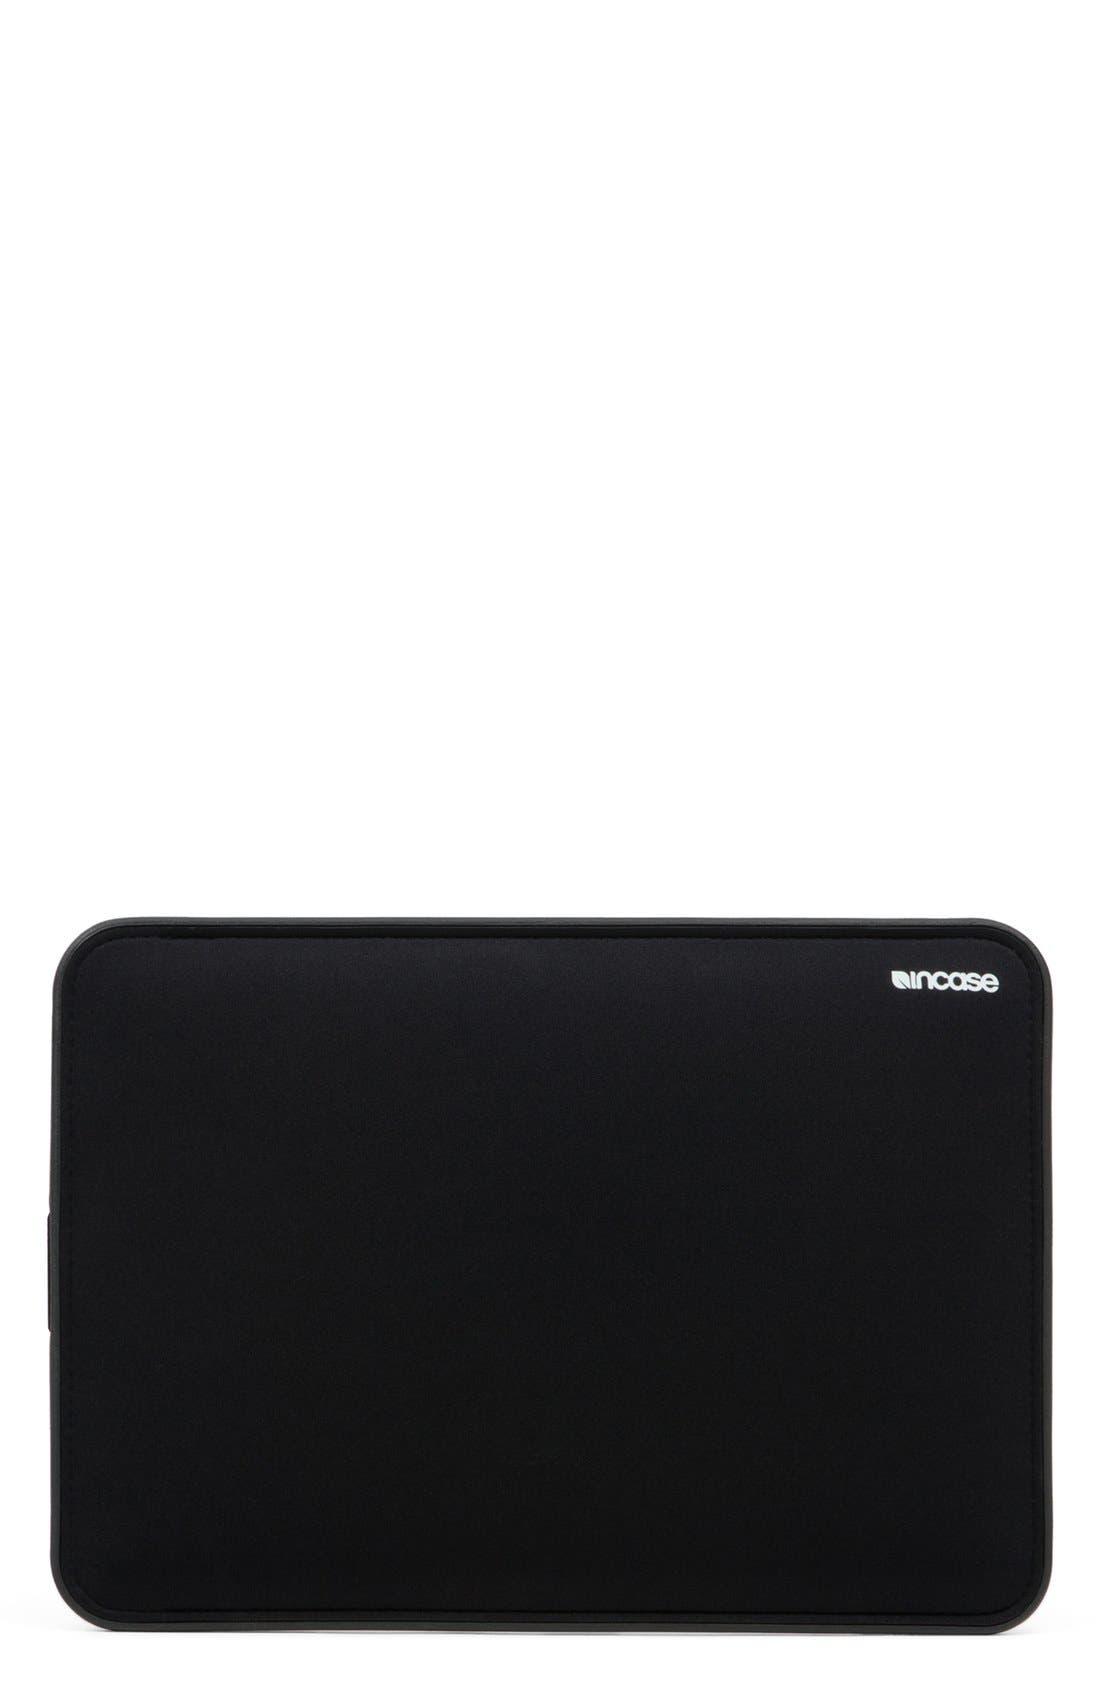 Incase Designs 'Icon' MacBook Pro Retina Laptop Sleeve (15 Inch)